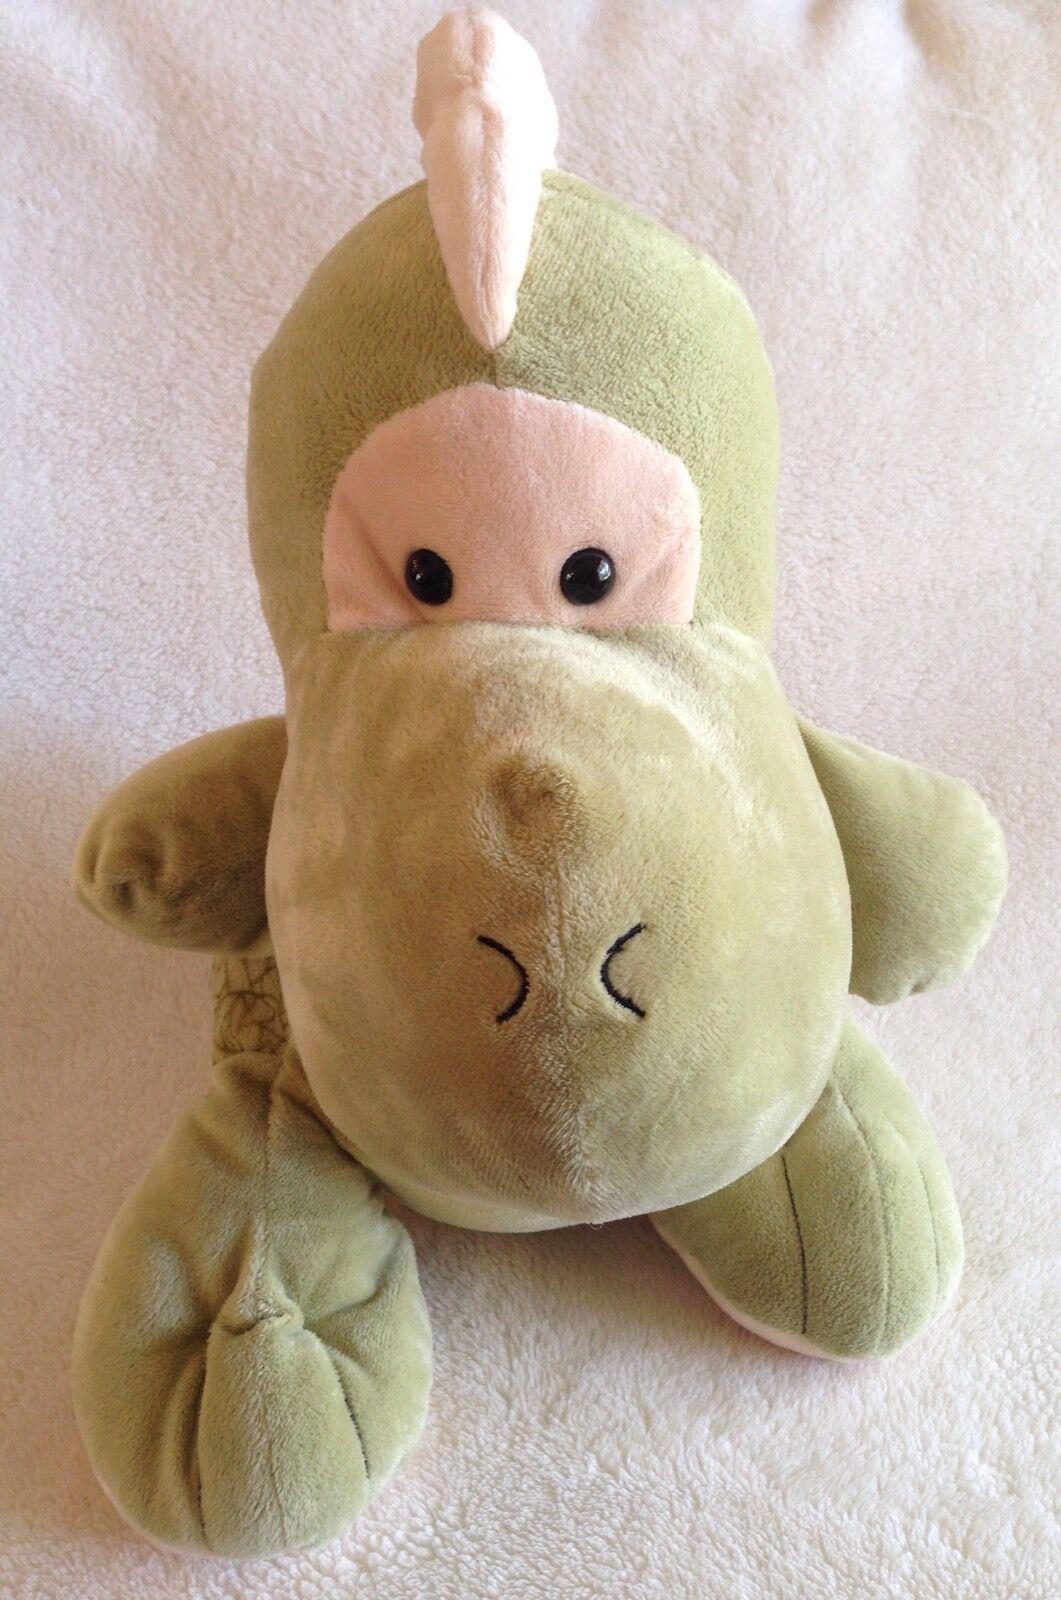 Toys R Us Plush Dinosaur Large verde Baby Bean Borsa Soft Stuffed Animal 19  2010